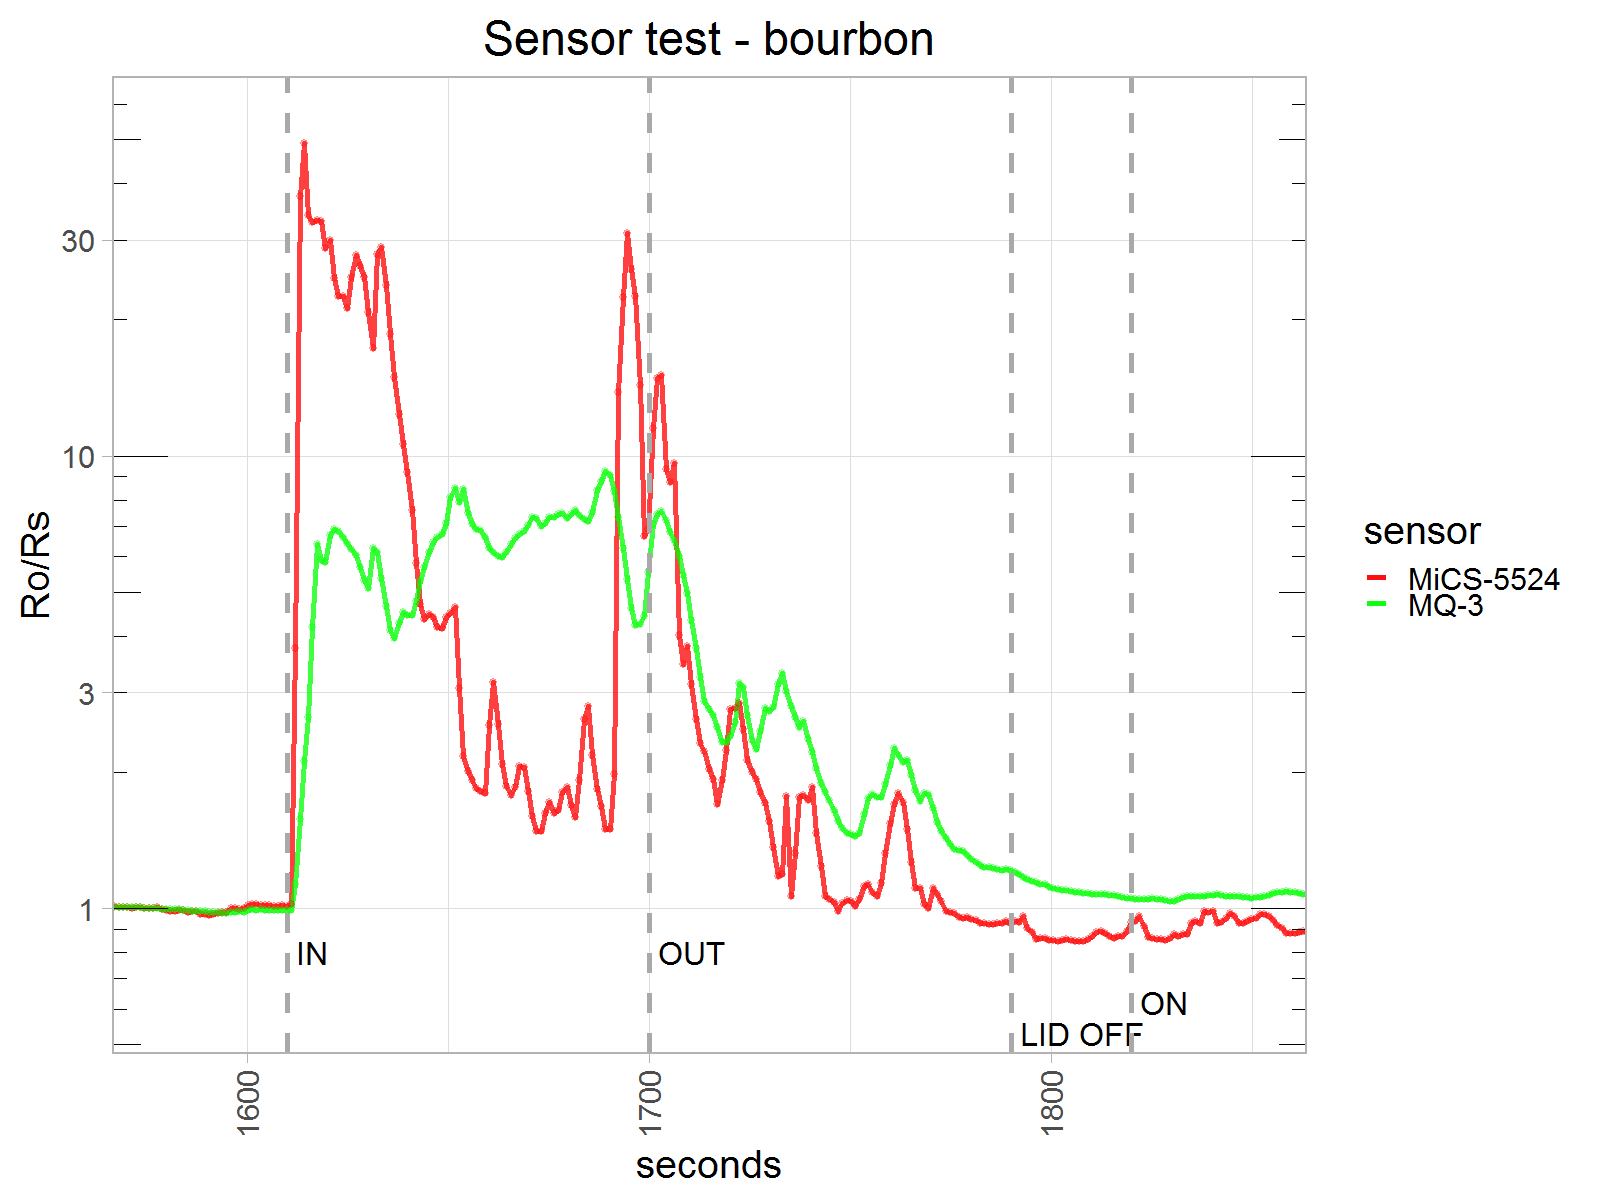 sensors_gas.sensor.test.20181022.t3.png